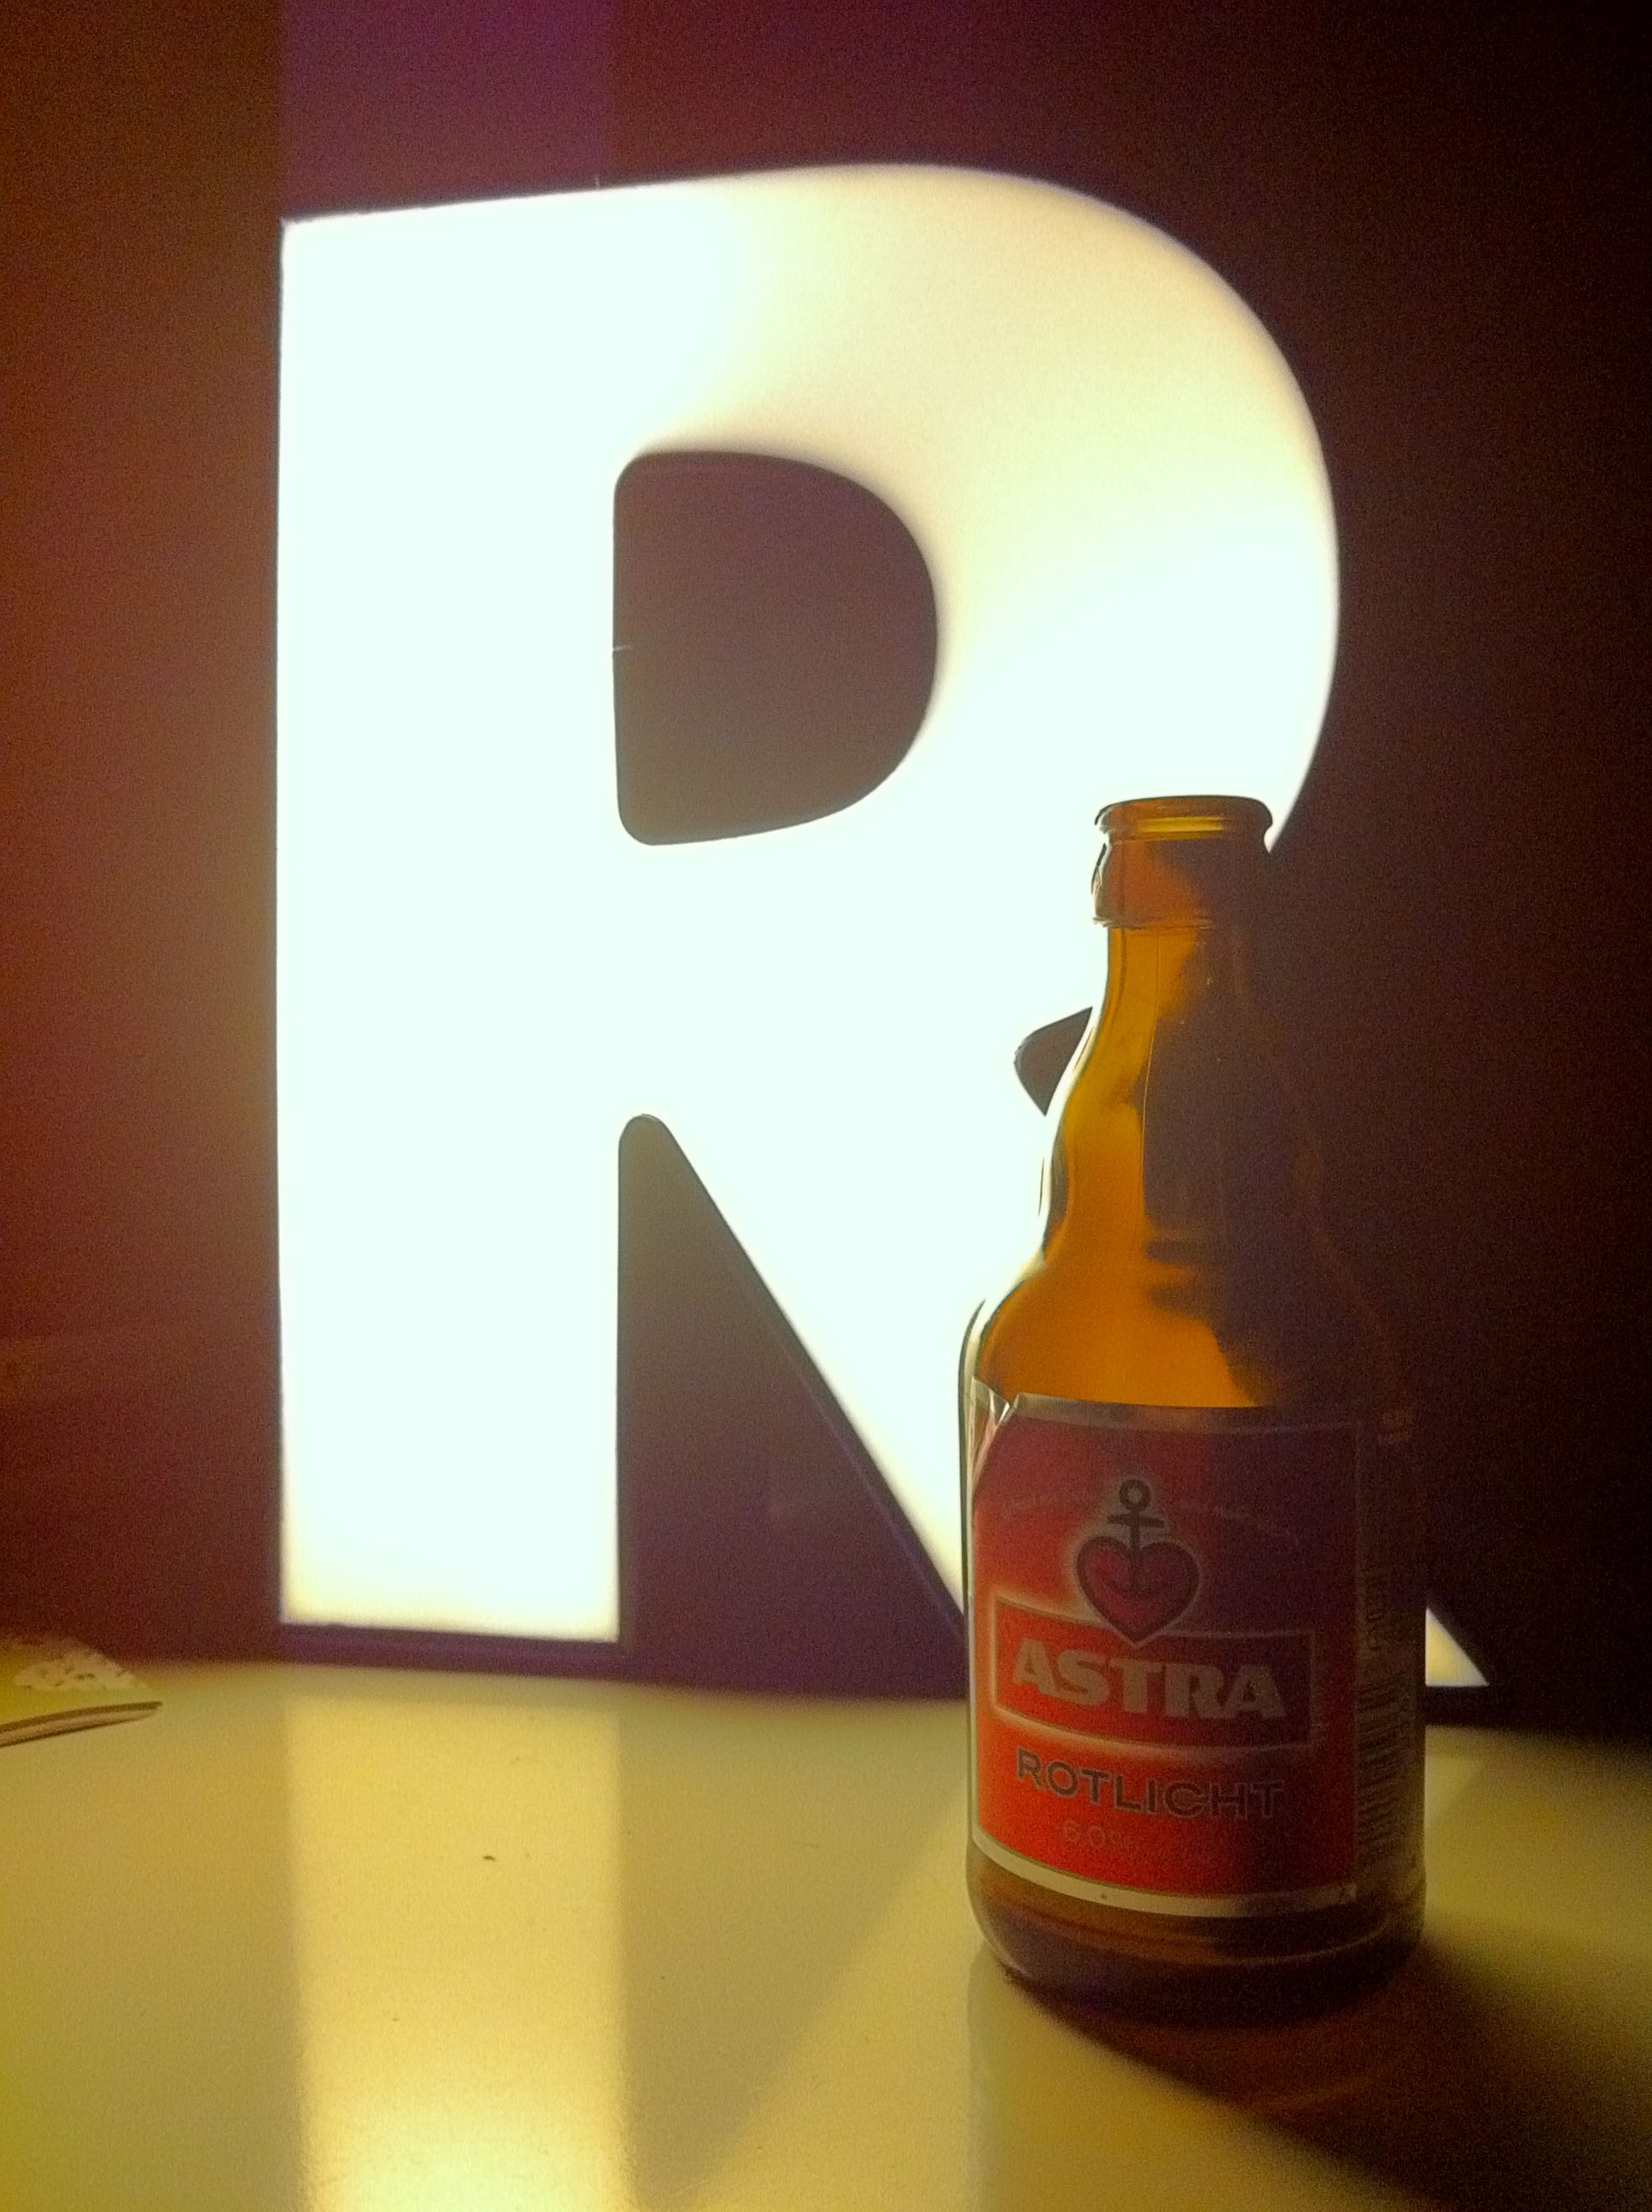 Rotlicht (Red Light) beer+ R, home, Berlin 2012